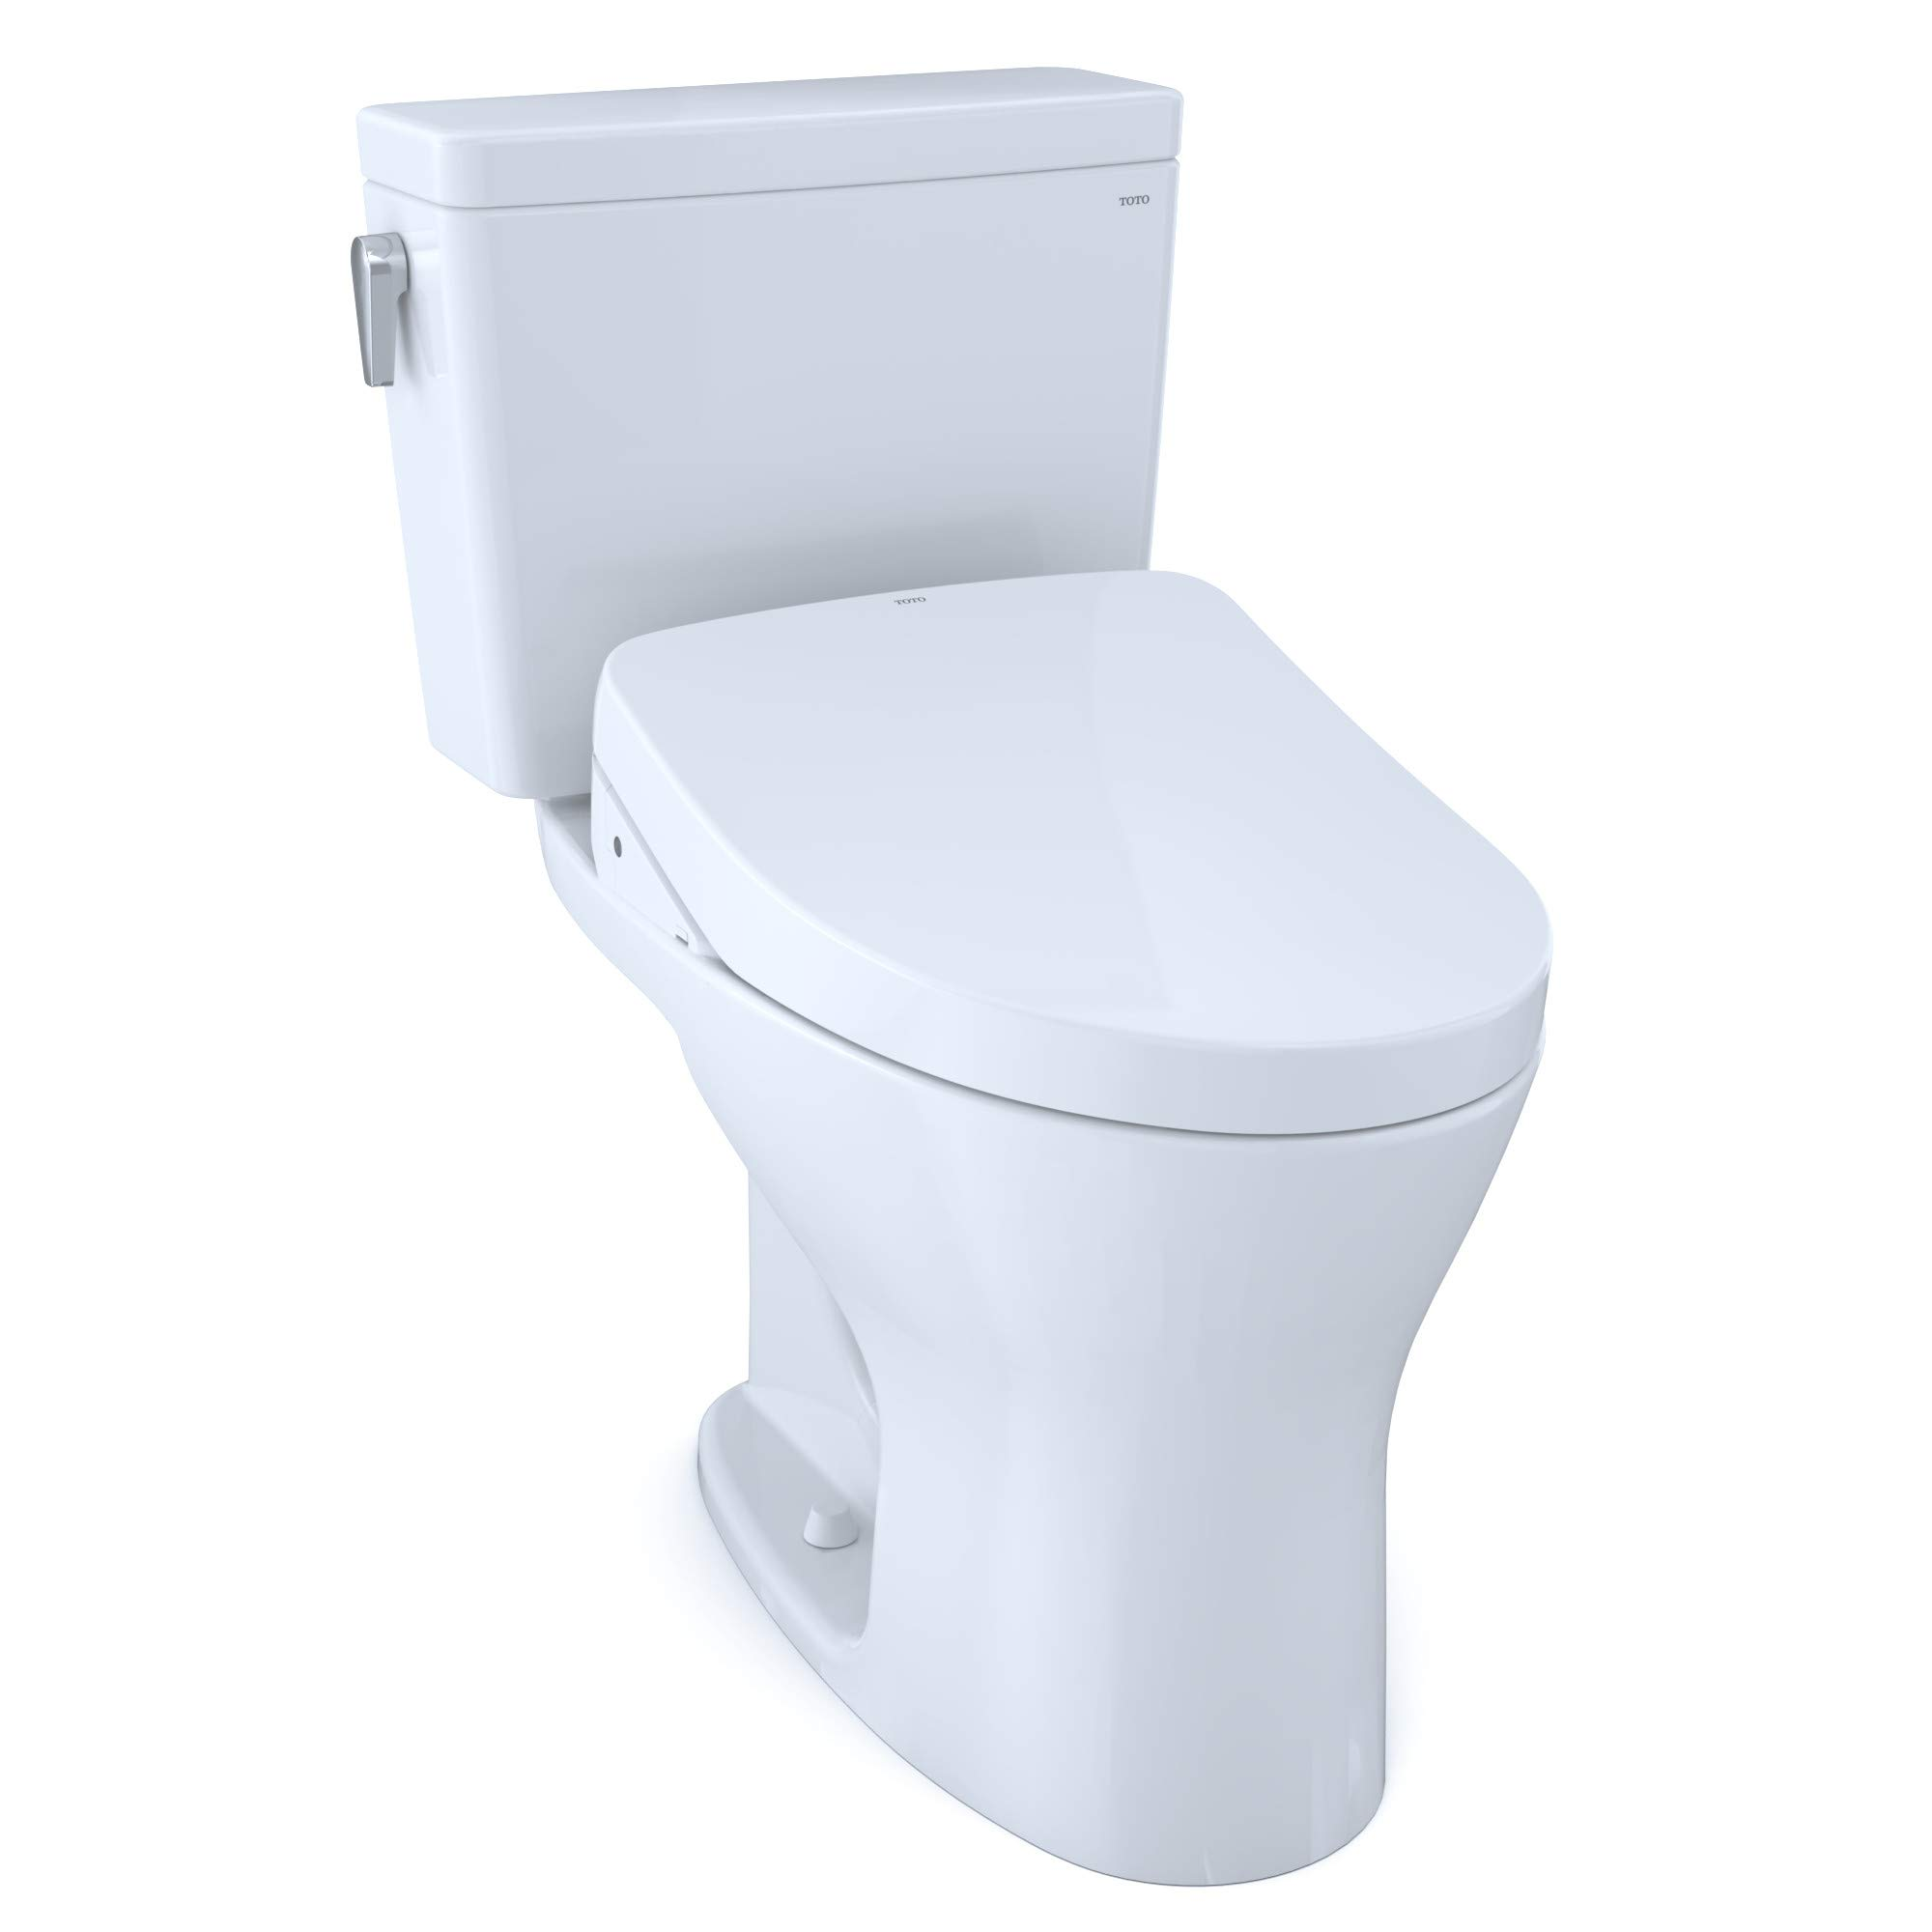 TOTO MW7463056CUMFG#01 Drake 1G WASHLET+ Two-Piece Elongated Dual Flush 1.0 and 0.8 GPF Universal Height DYNAMAX TORNADO FLUSH Toilet with S550e Bidet Seat, Cotton White